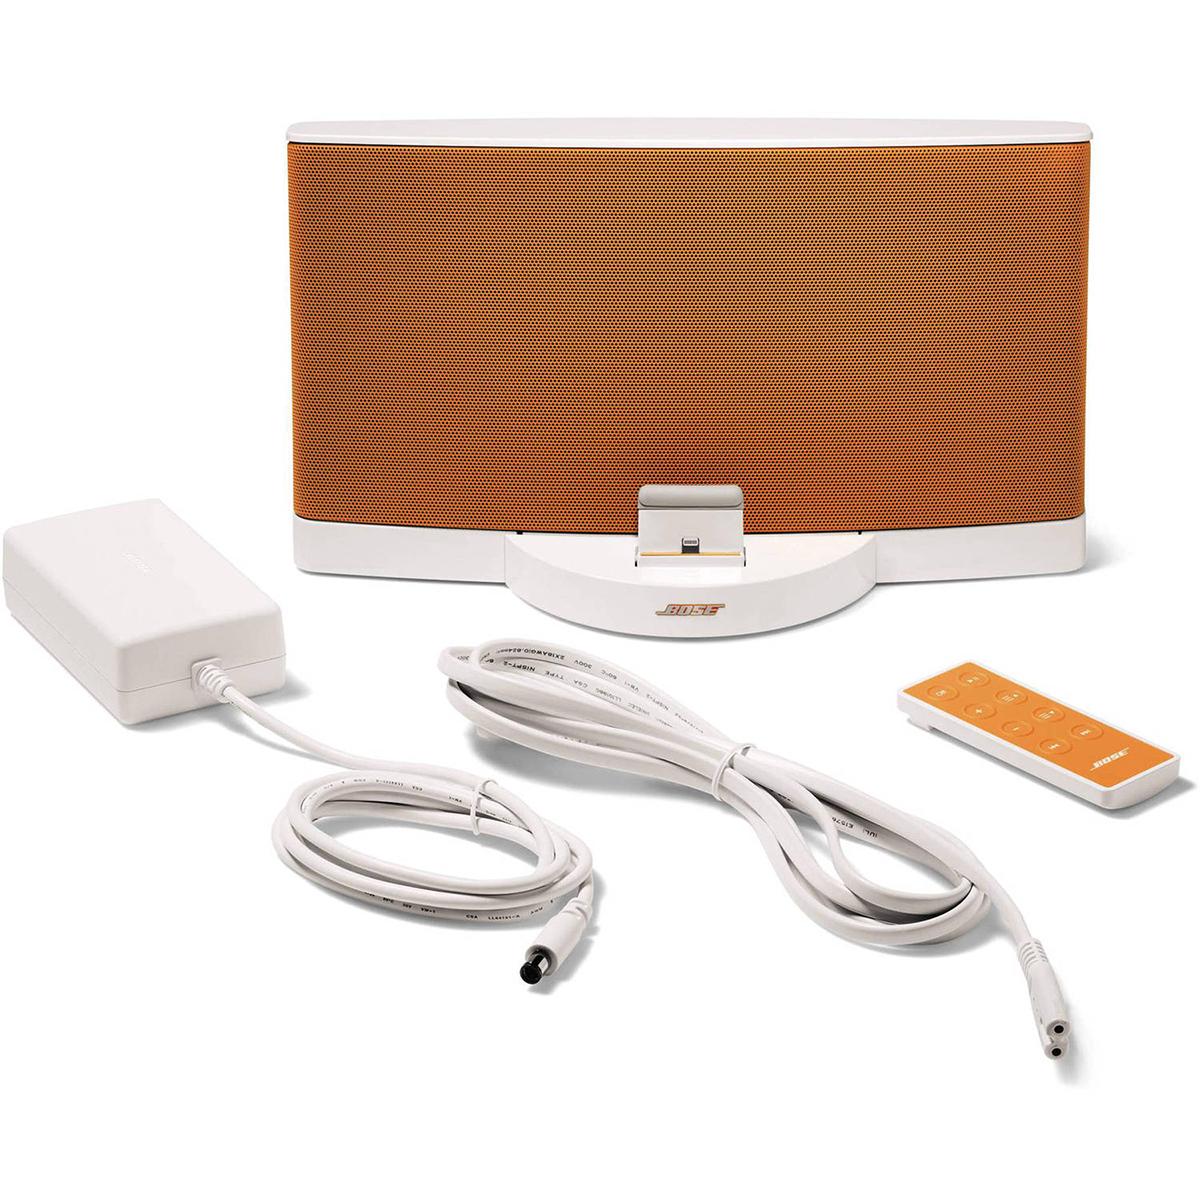 Bose SoundDock Digital Music System (Series III, Orange)_1